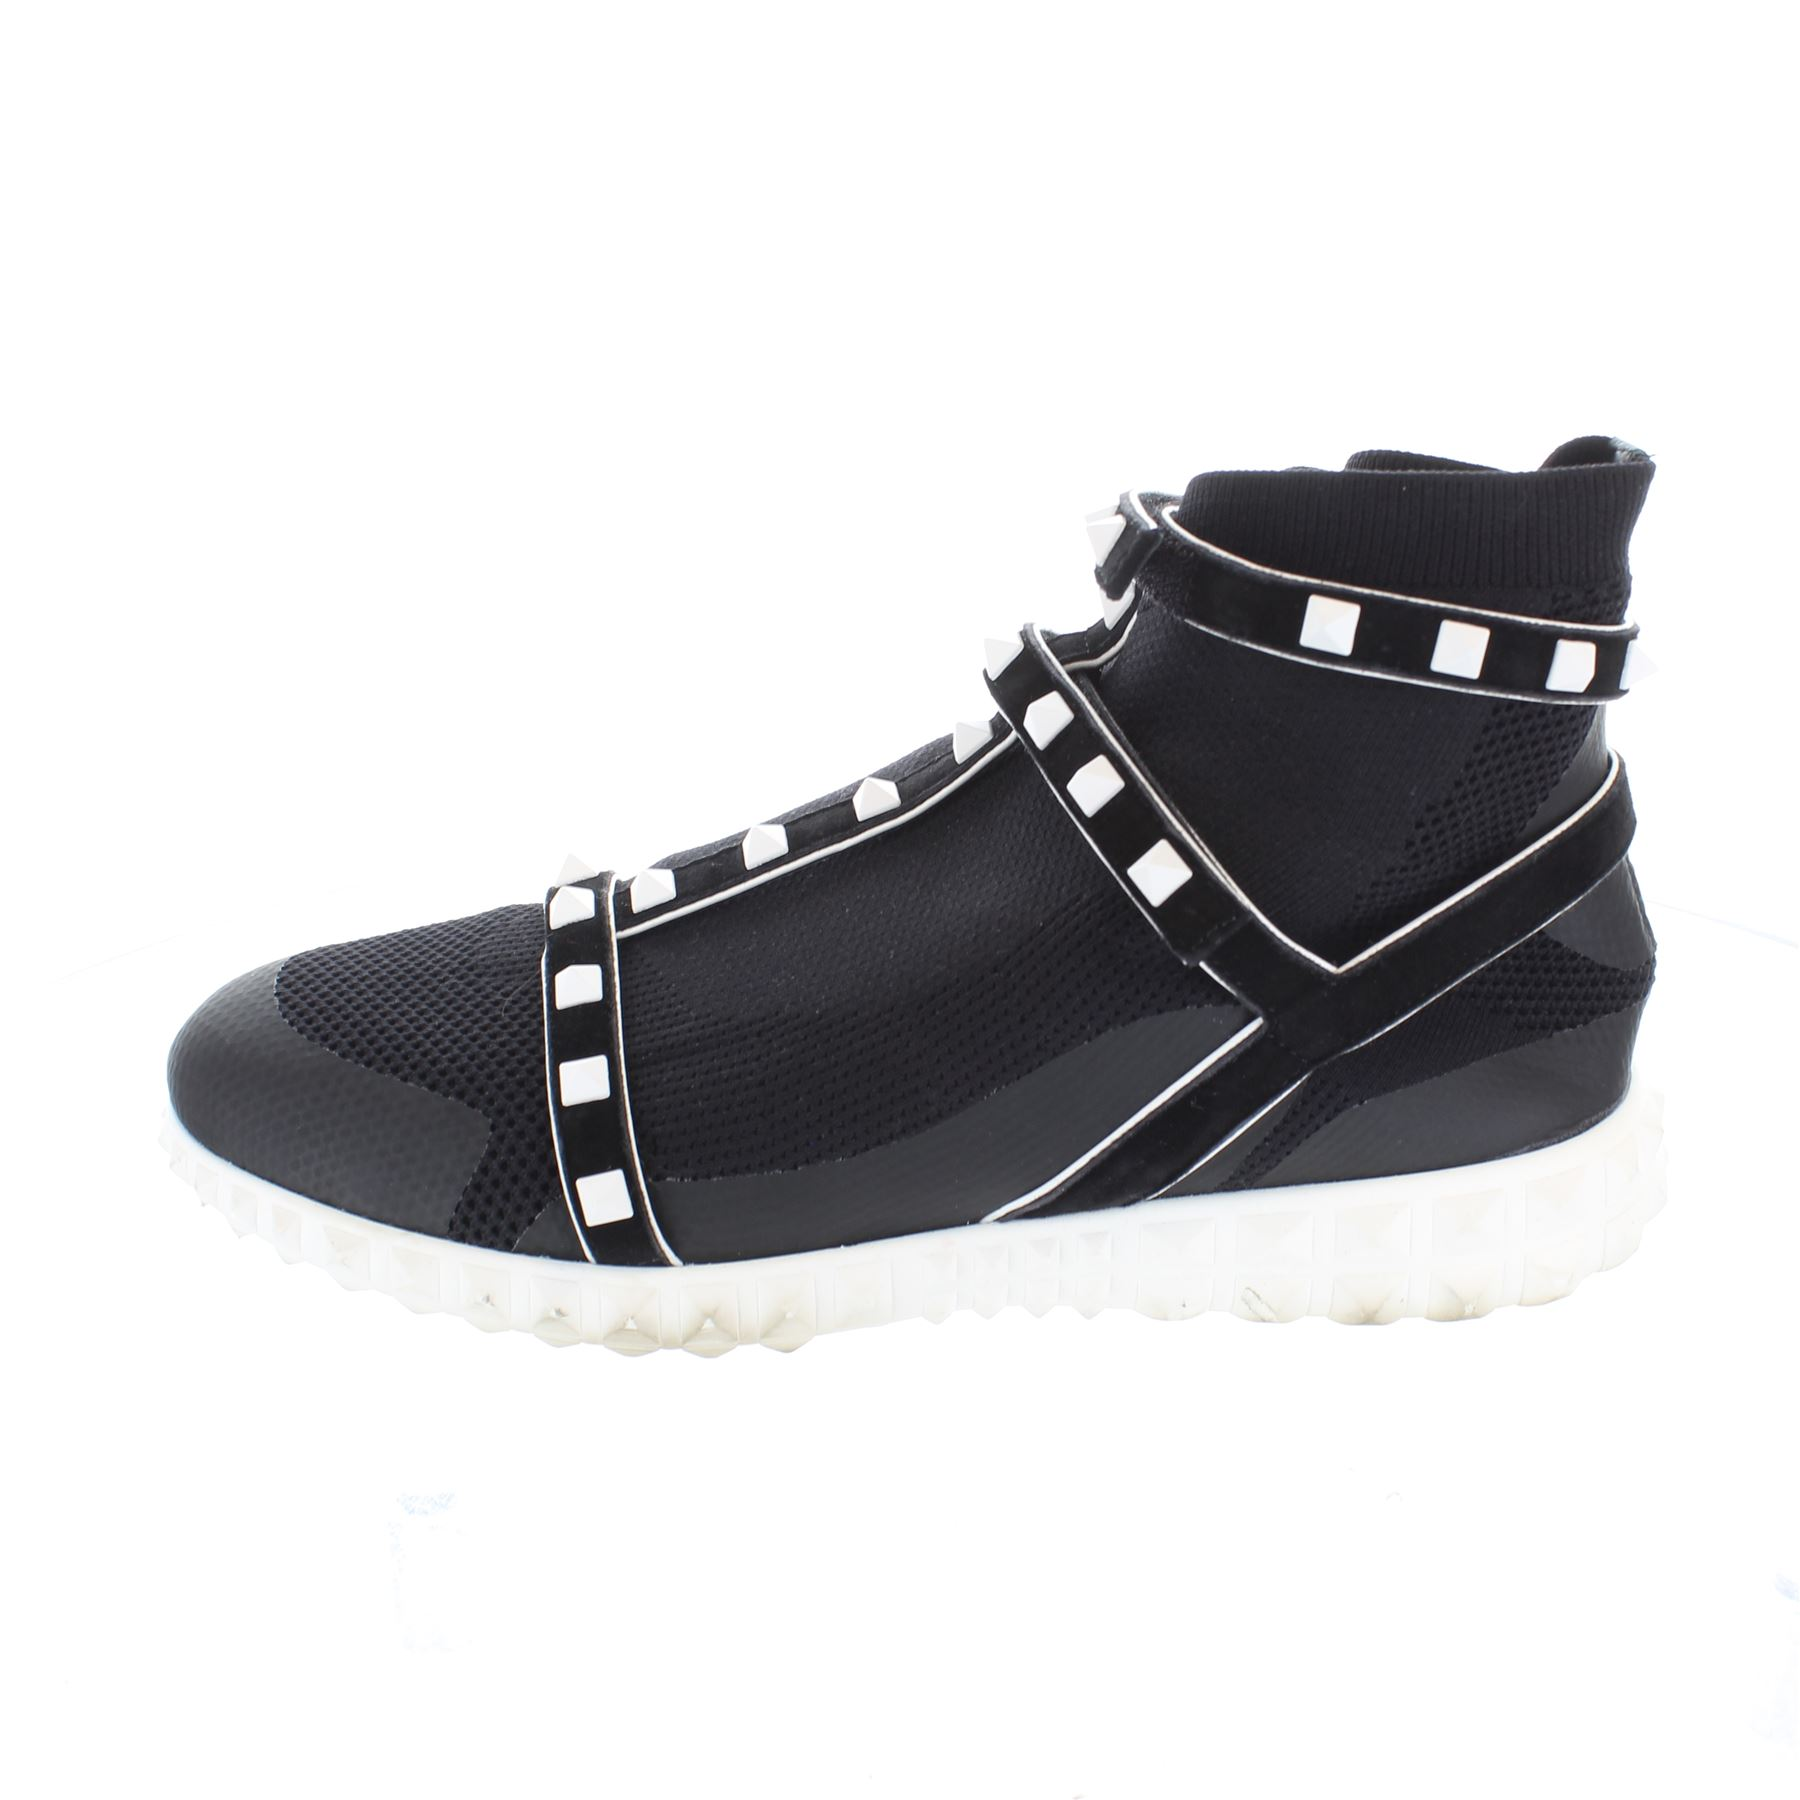 VALENTINO Rockstud Black Sock Cloth